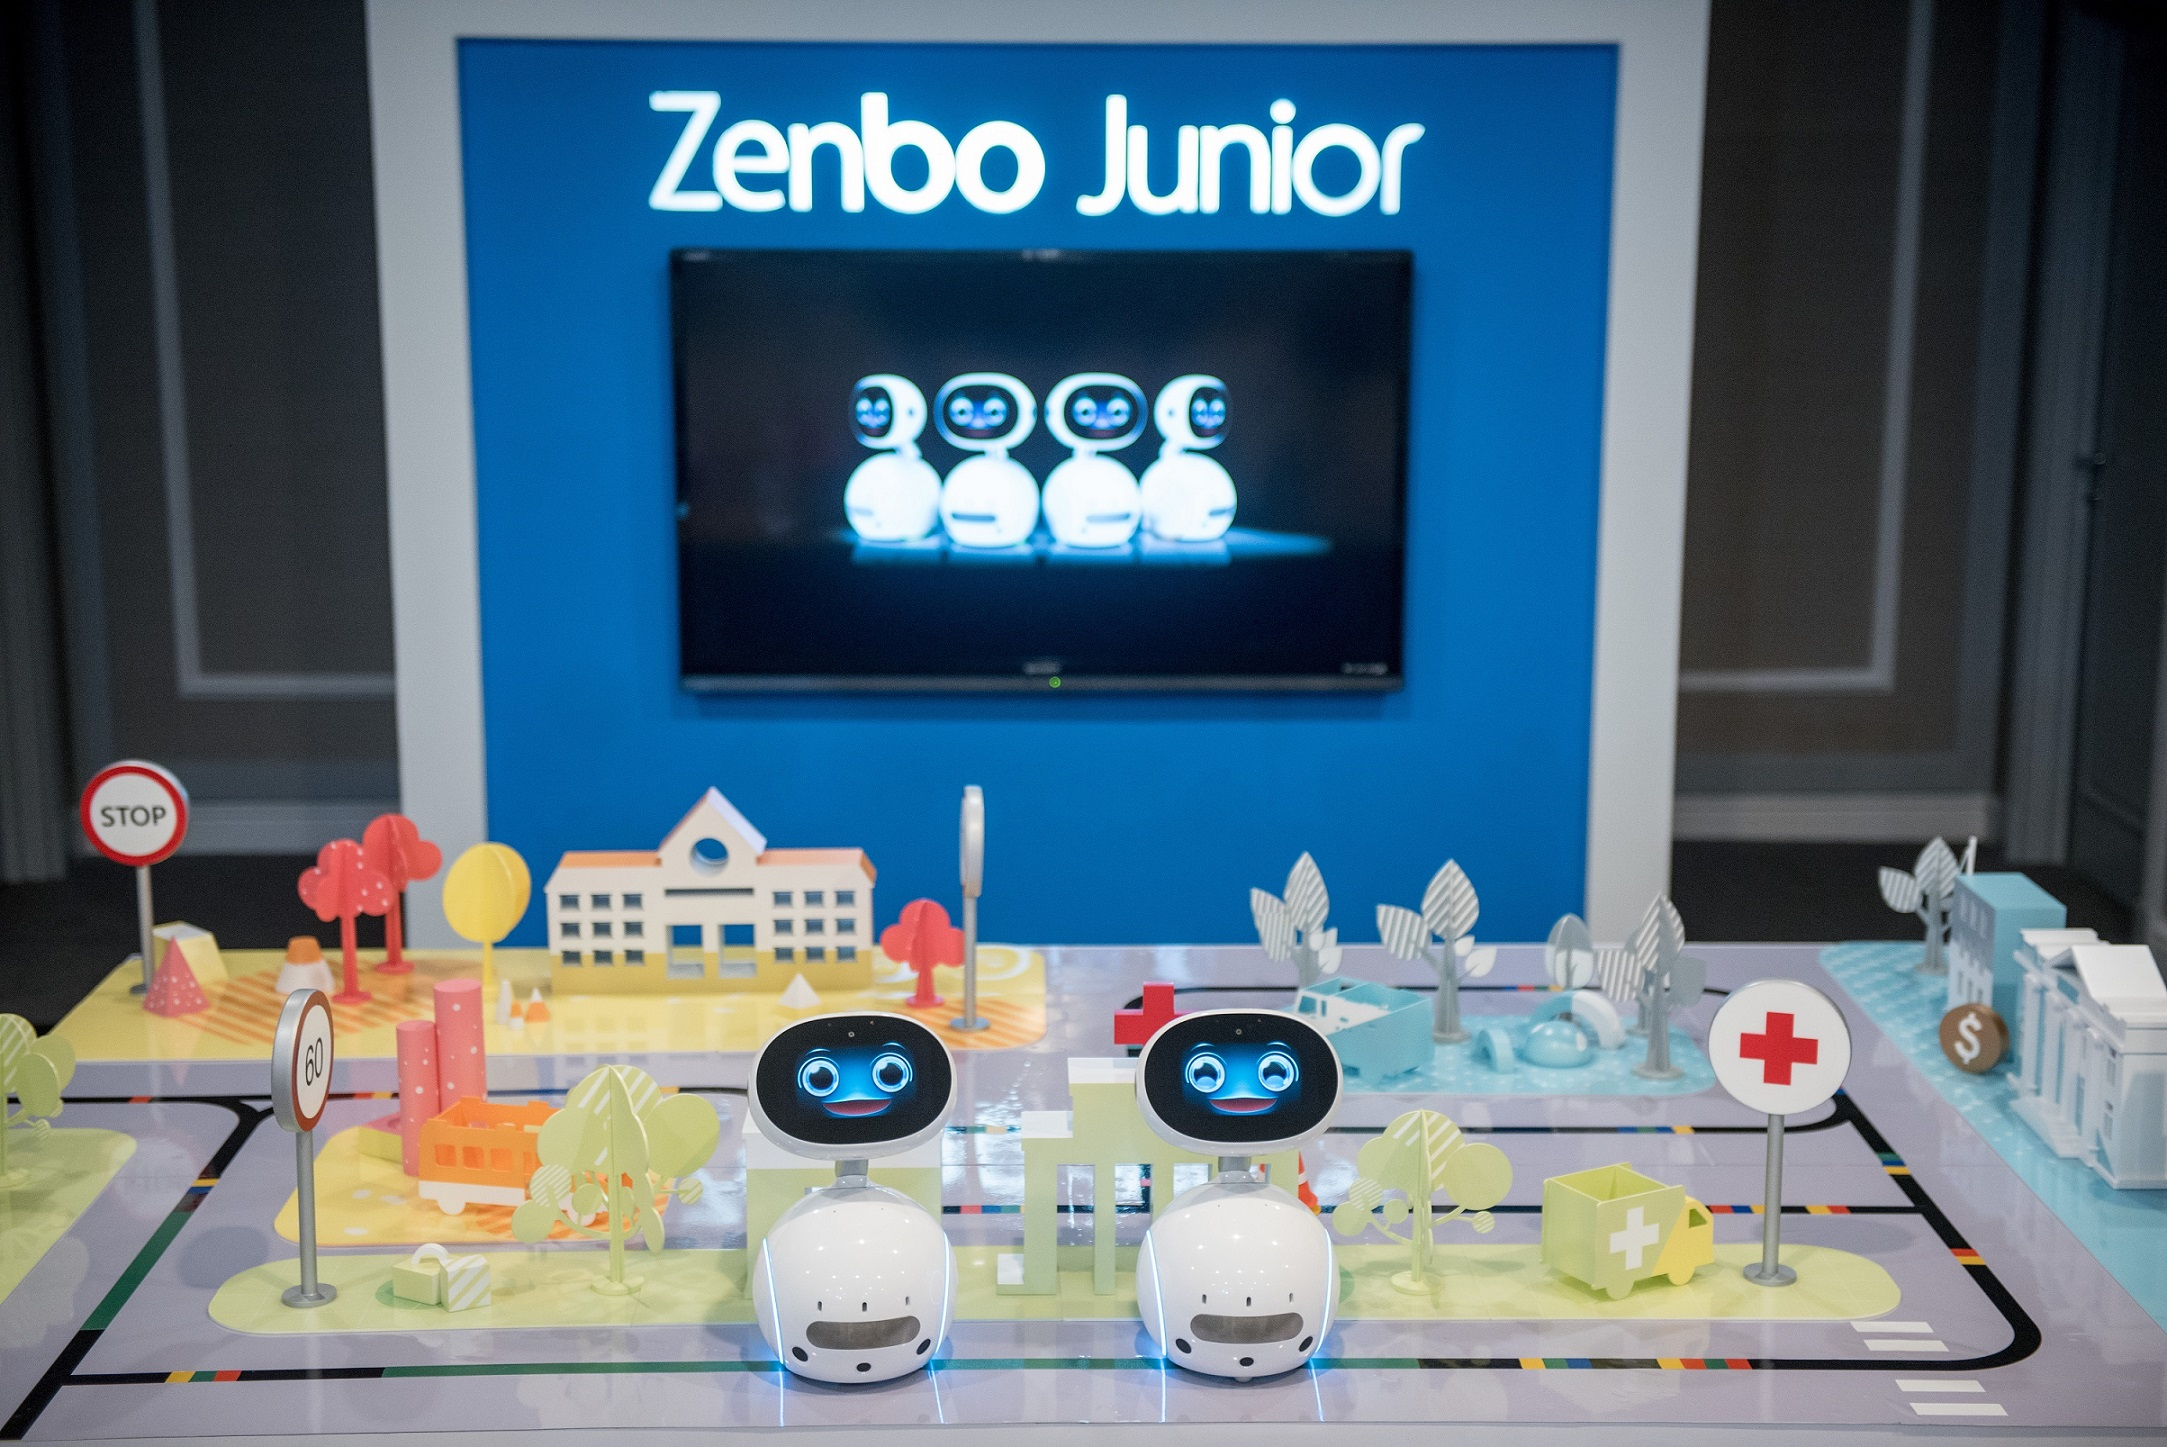 zenbo junior is a new ai enabled robotics platform that allows developers system integrators and business partners to create flexible and easily manageable robotics solutions ASUS โชว์นวัตกรรมสินค้าสำหรับการใช้งานในองค์กรธุรกิจ บ้านและการเล่นเกม ที่งาน Incredible Intelligence 2018 ประเทศมาเลเซีย